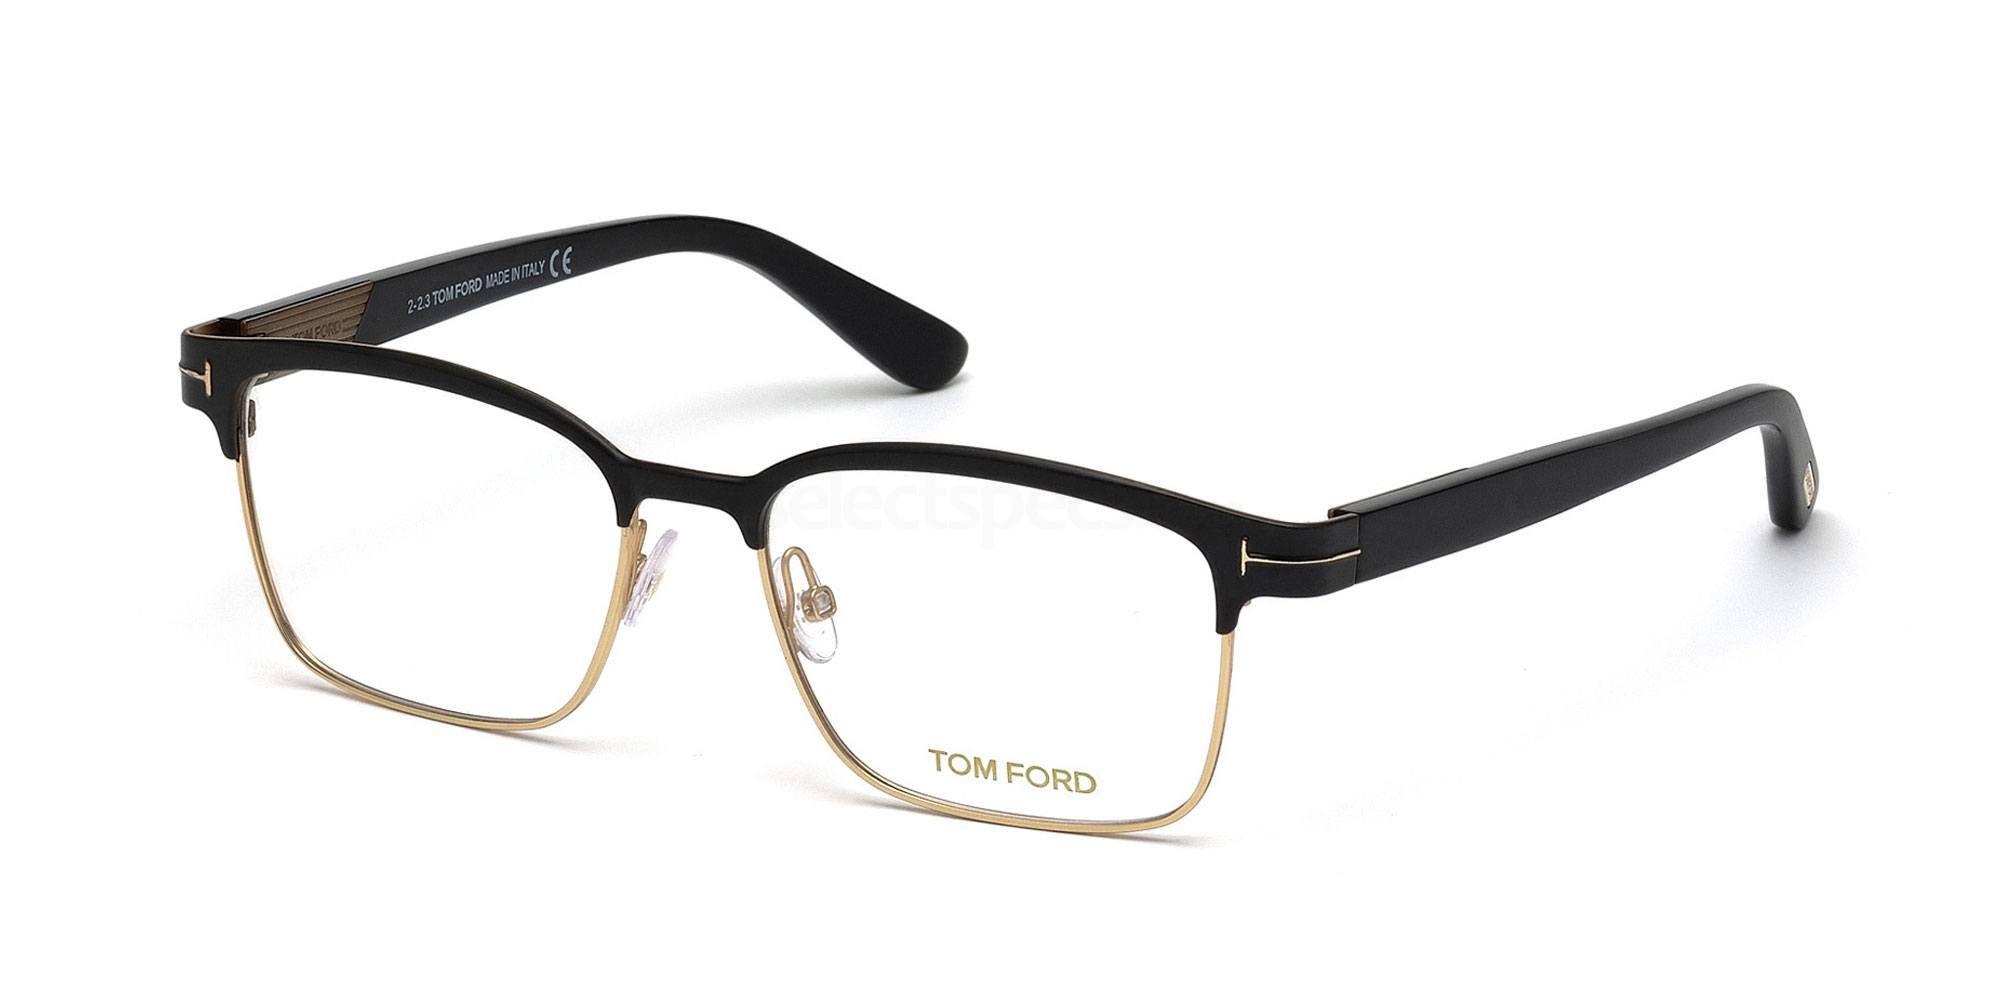 3aef62a8bd7 FT5323. tom ford ft5323 glasses free lenses   delivery australia.  SELECTSPECS